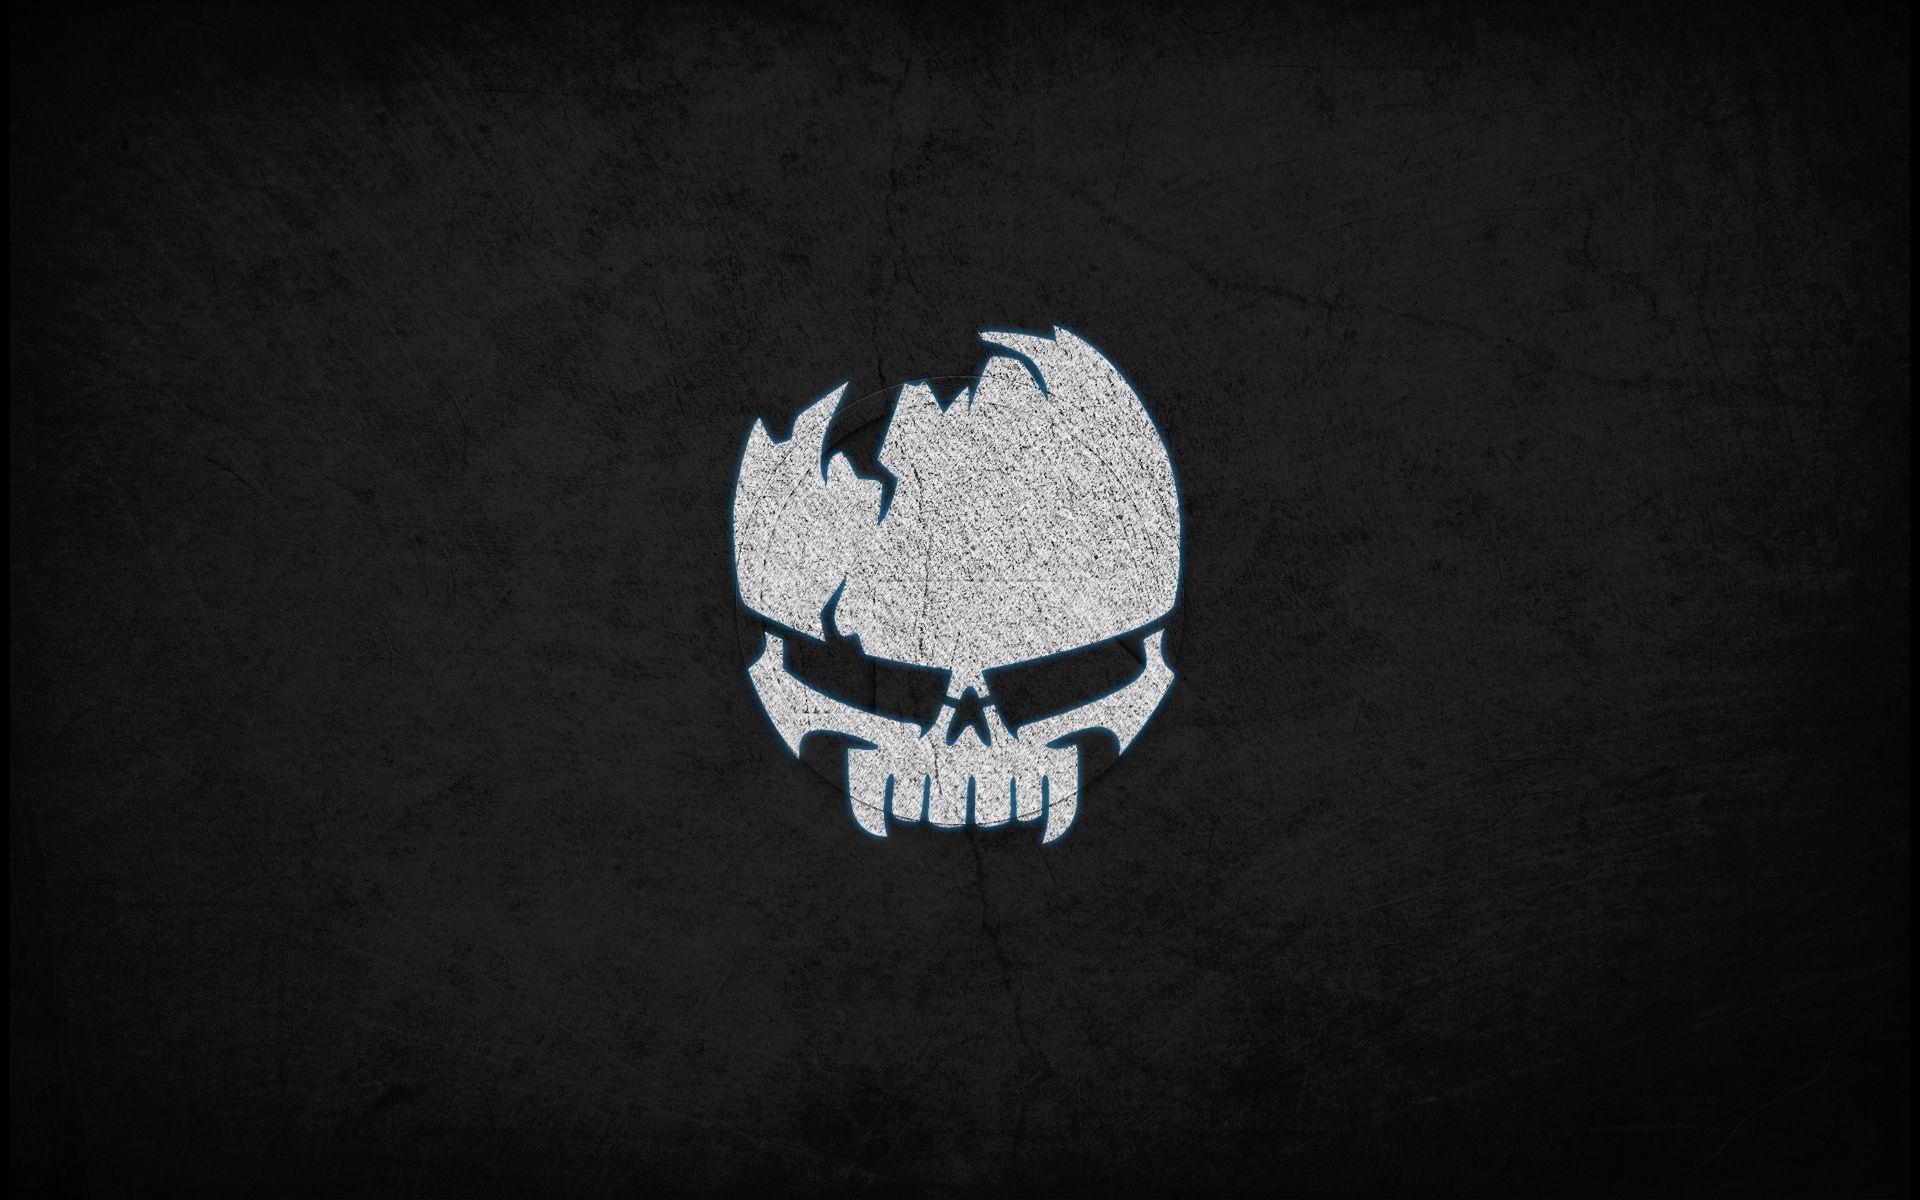 cool skull wallpaper hd 1920×1200 cool hd skull wallpapers (47